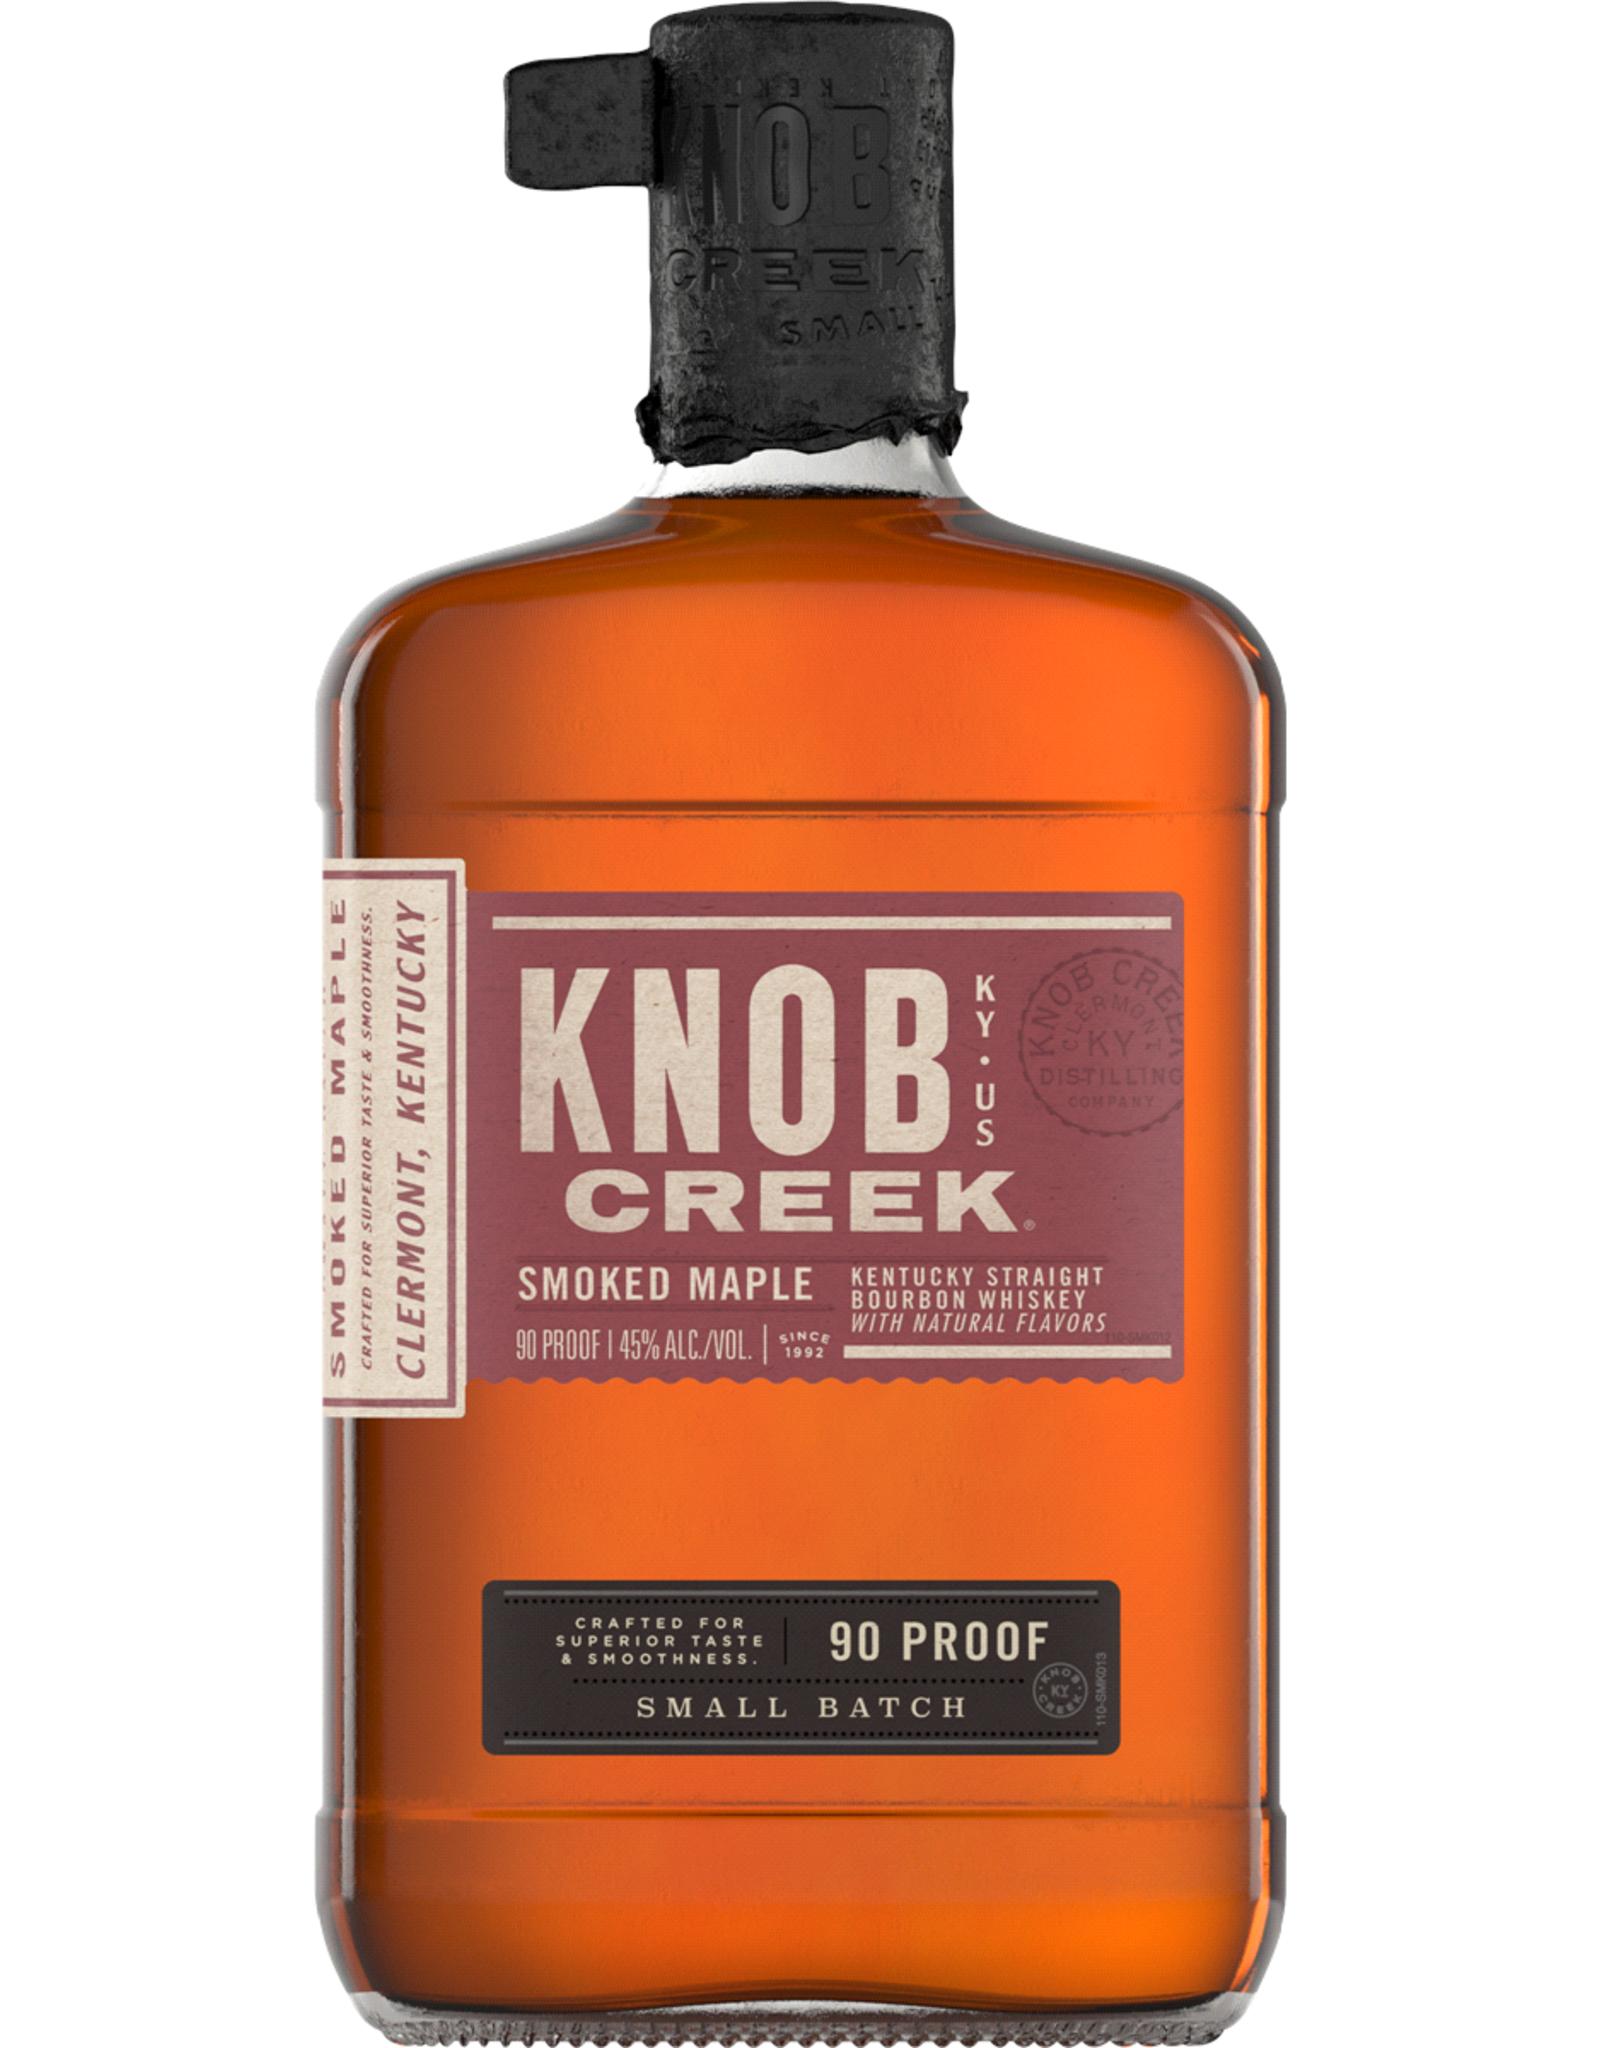 Knob Creek Knob Creek Smoked Maple 750ML